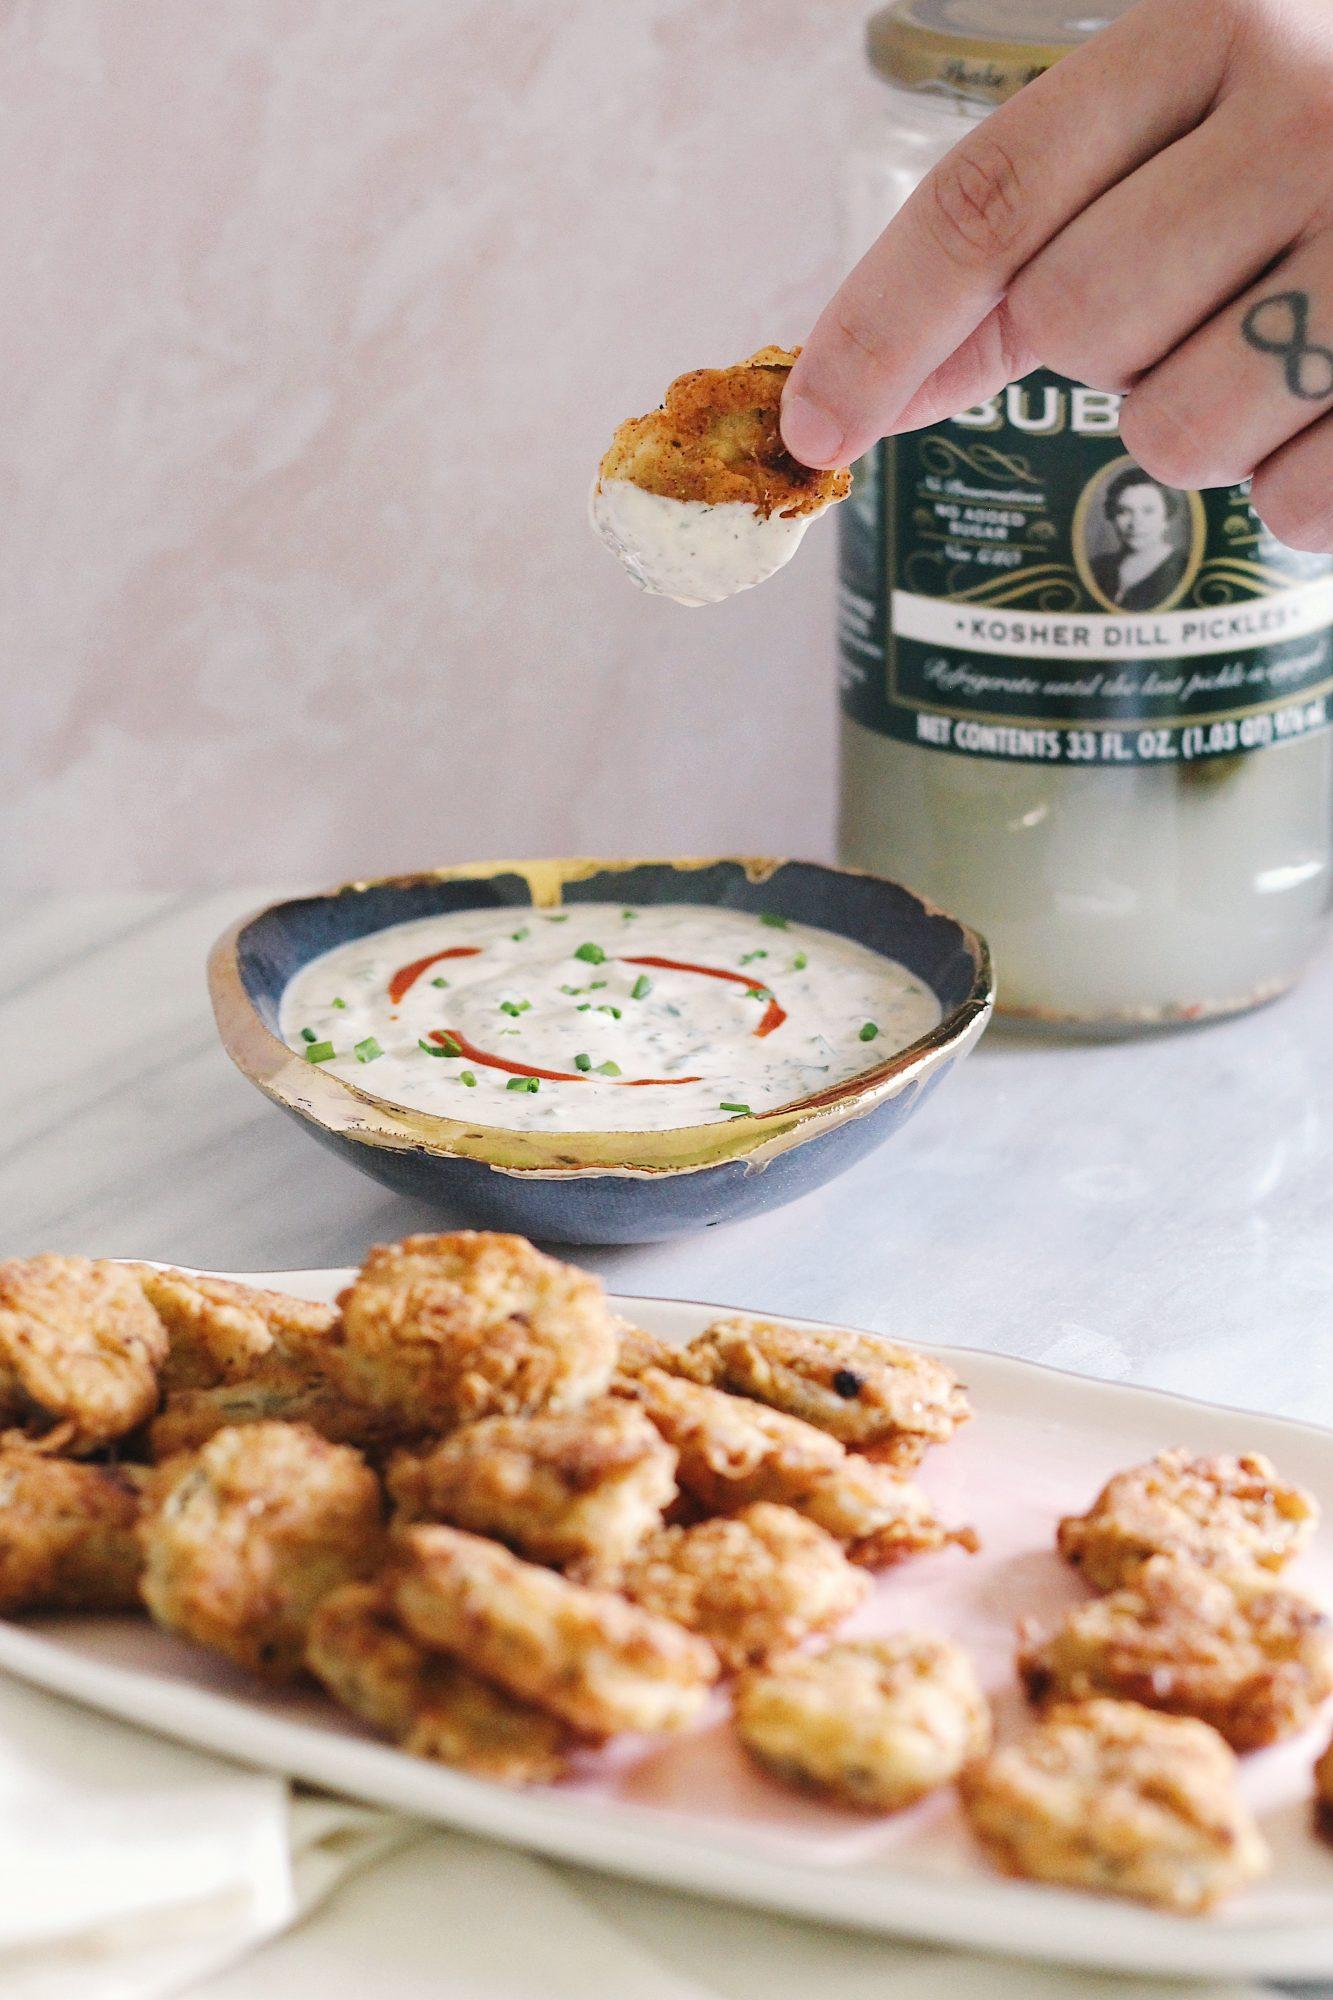 delicious crispy pickles with a creamy ranch dip